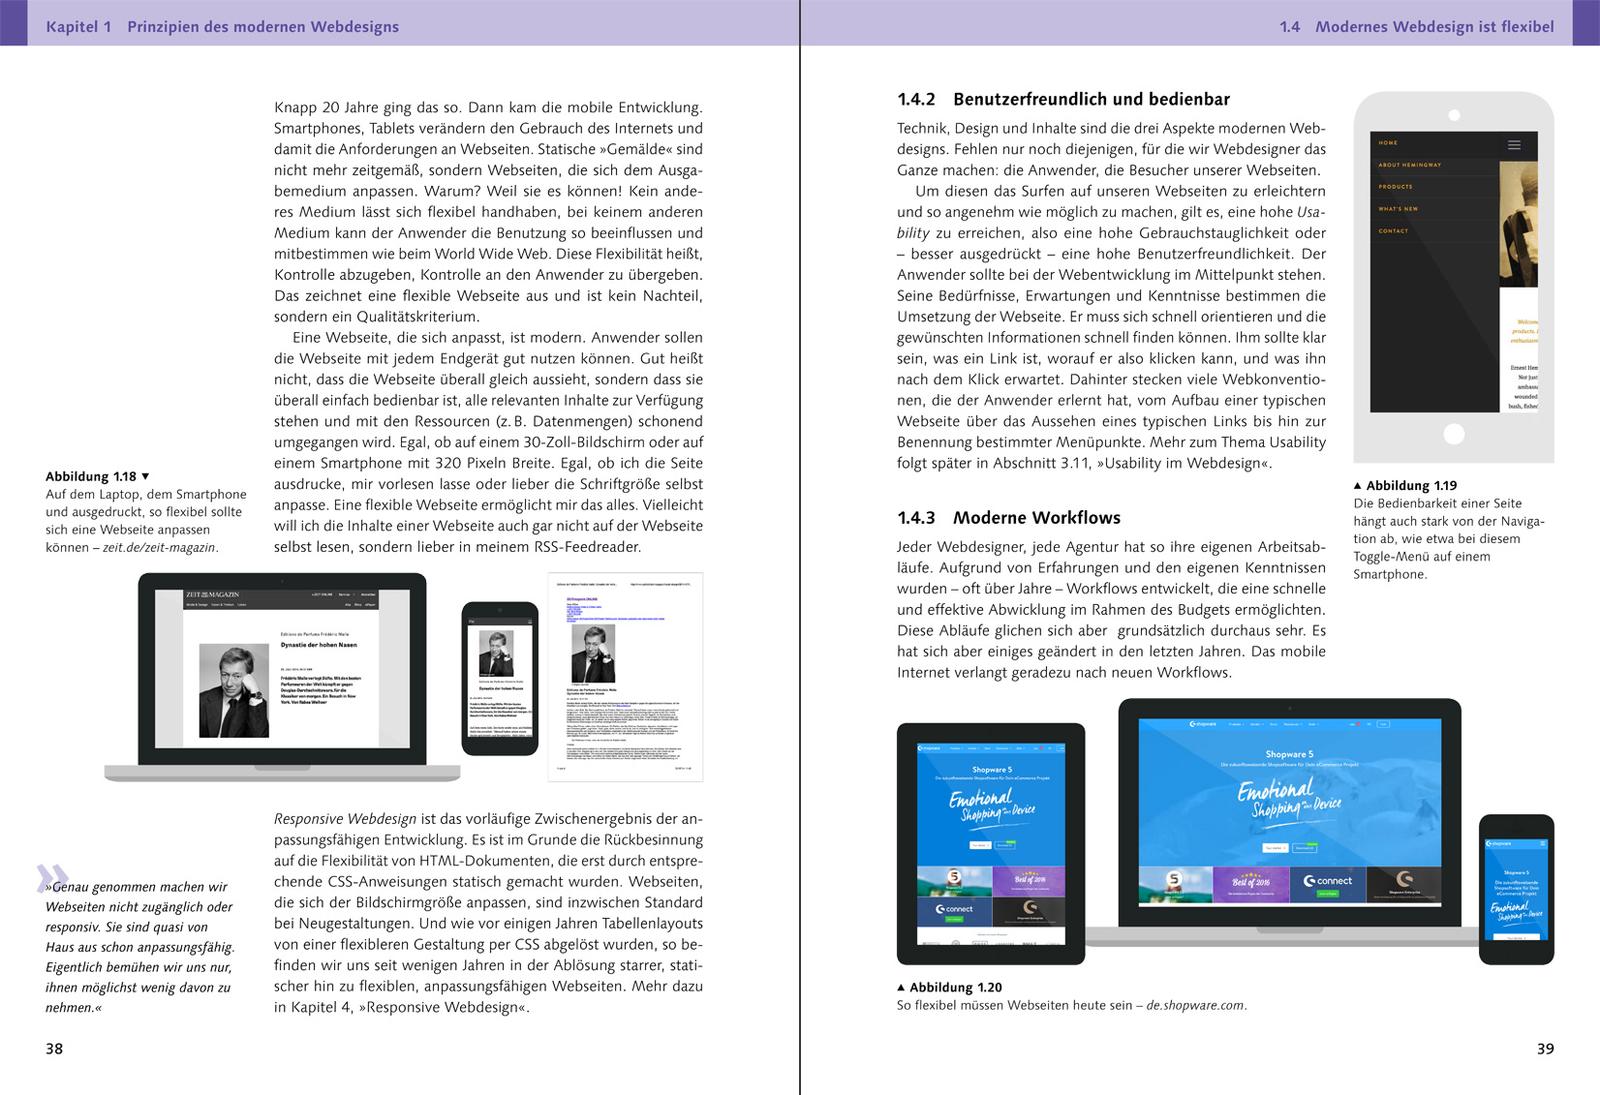 Webdesign - Das Handbuch zur Webgestaltung - Webdesign Journal